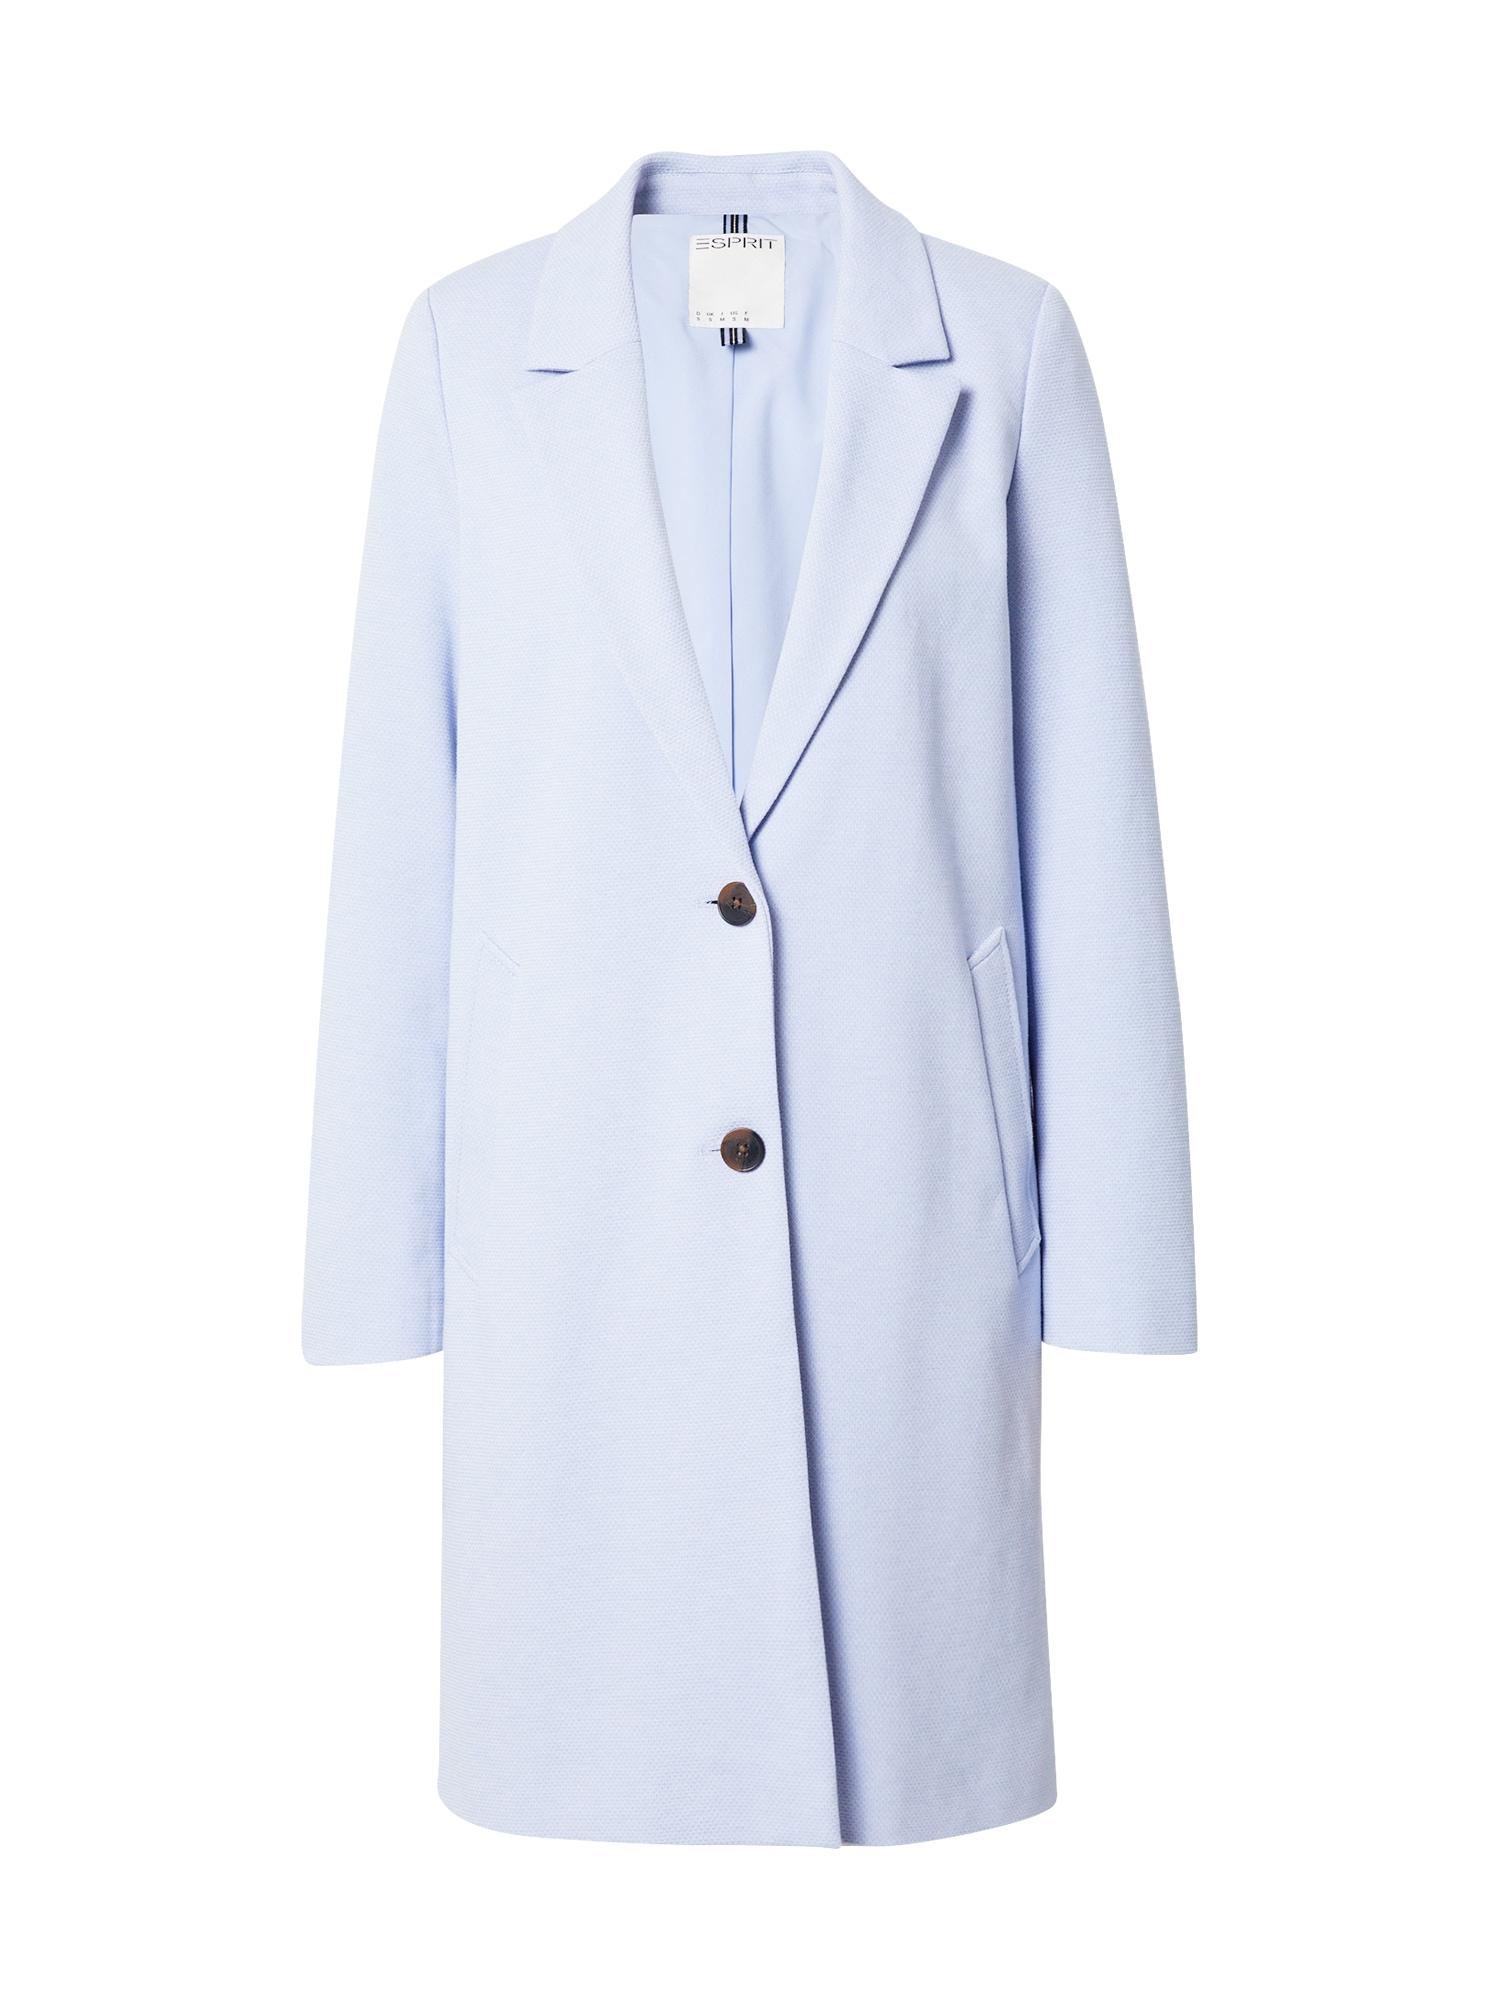 ESPRIT Demisezoninis paltas pastelinė mėlyna